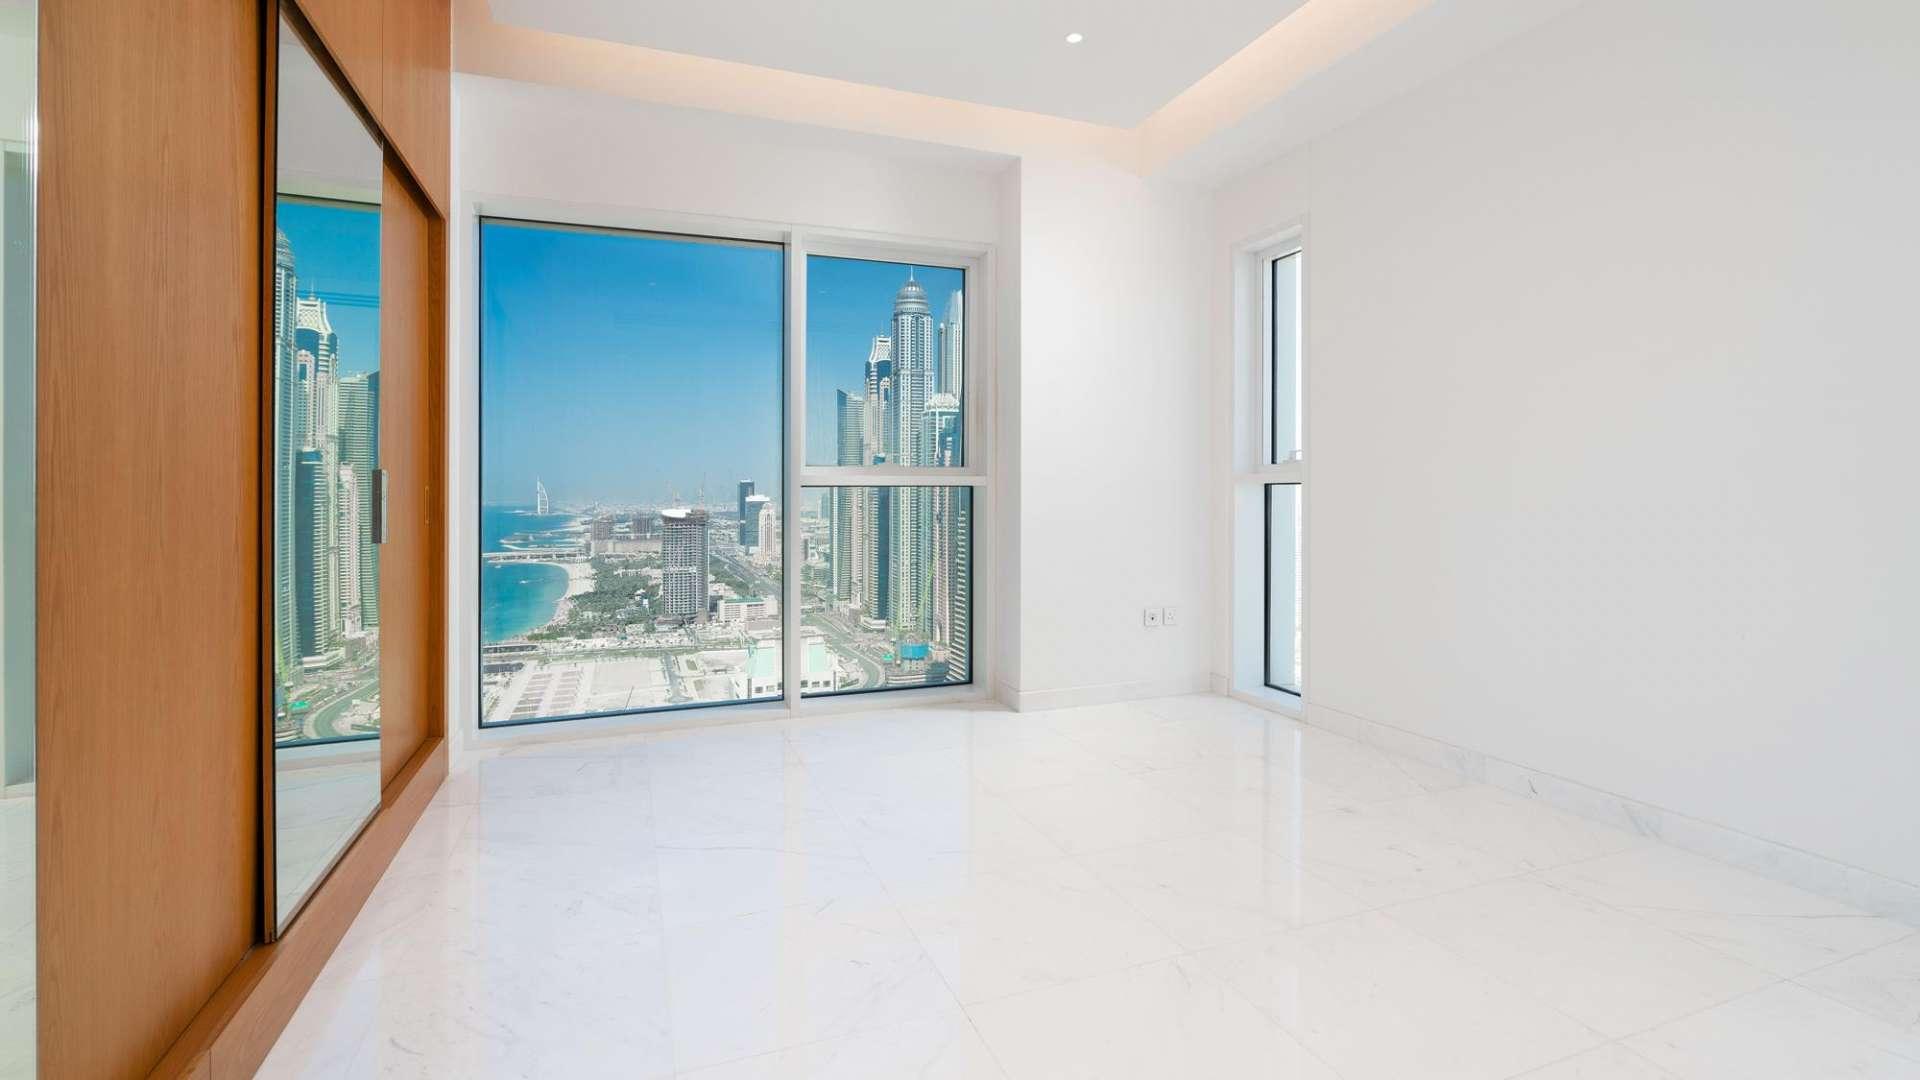 1/JBR, Jumeirah Beach Residence